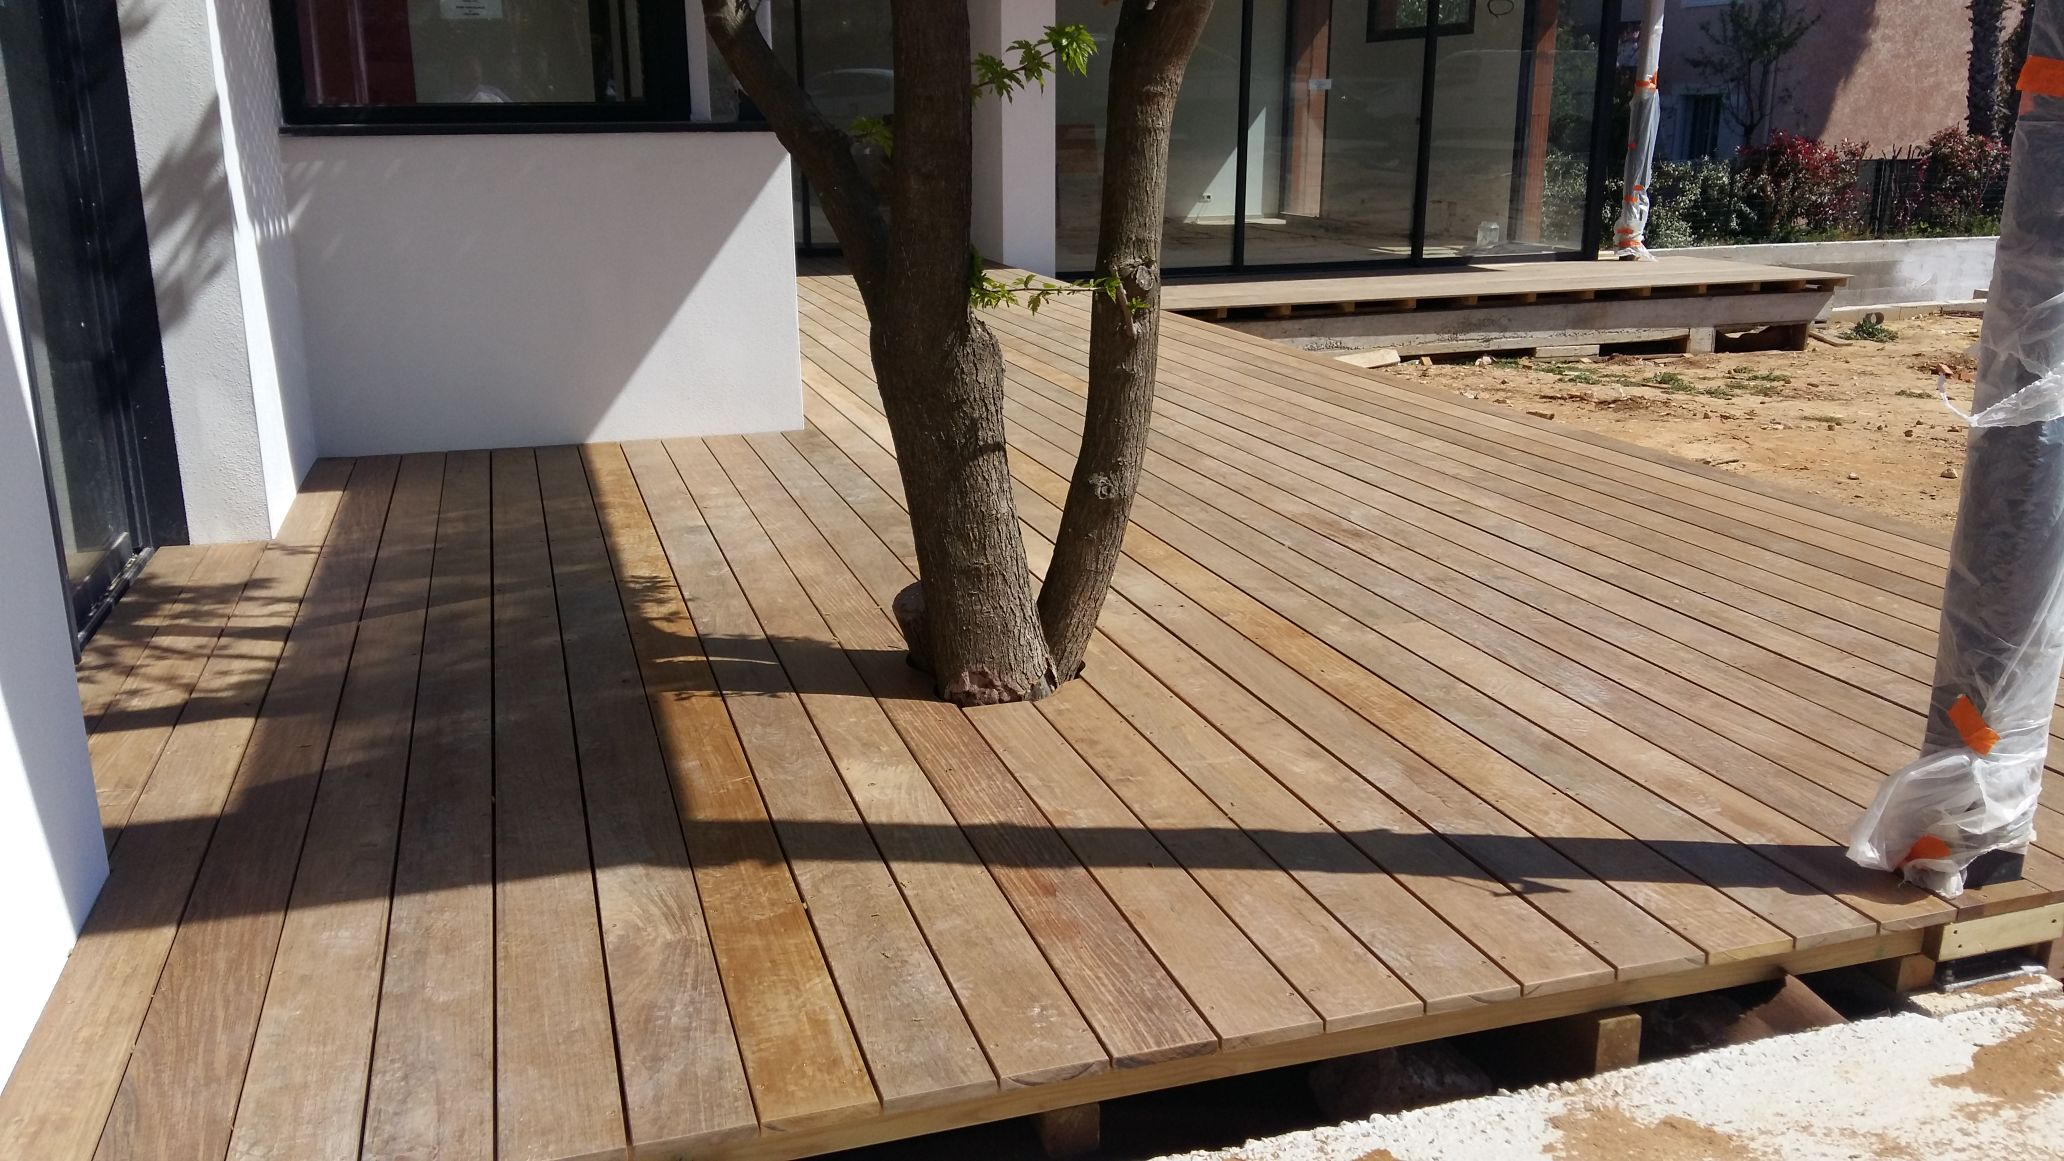 terrasse_bois_saint_jean_de_vedas_34_1.jpg